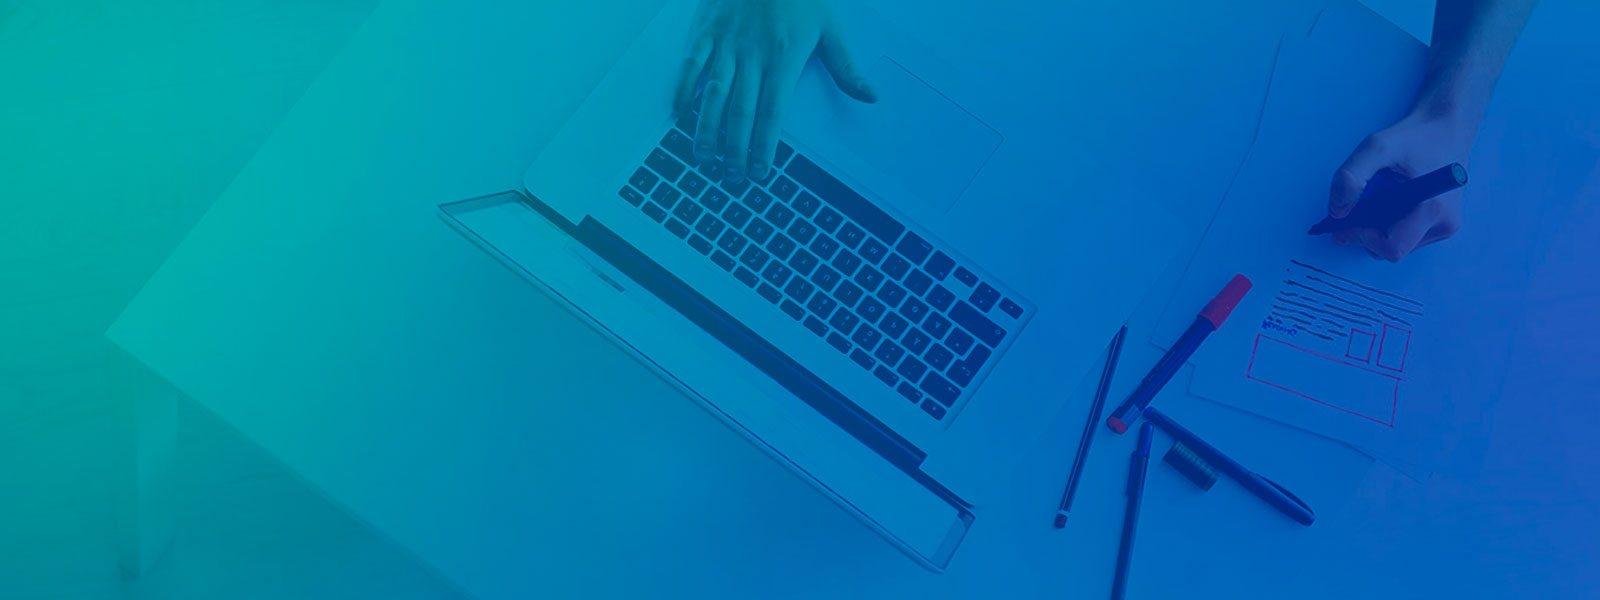 siteoncriacoes-slideshow-002-webdesign